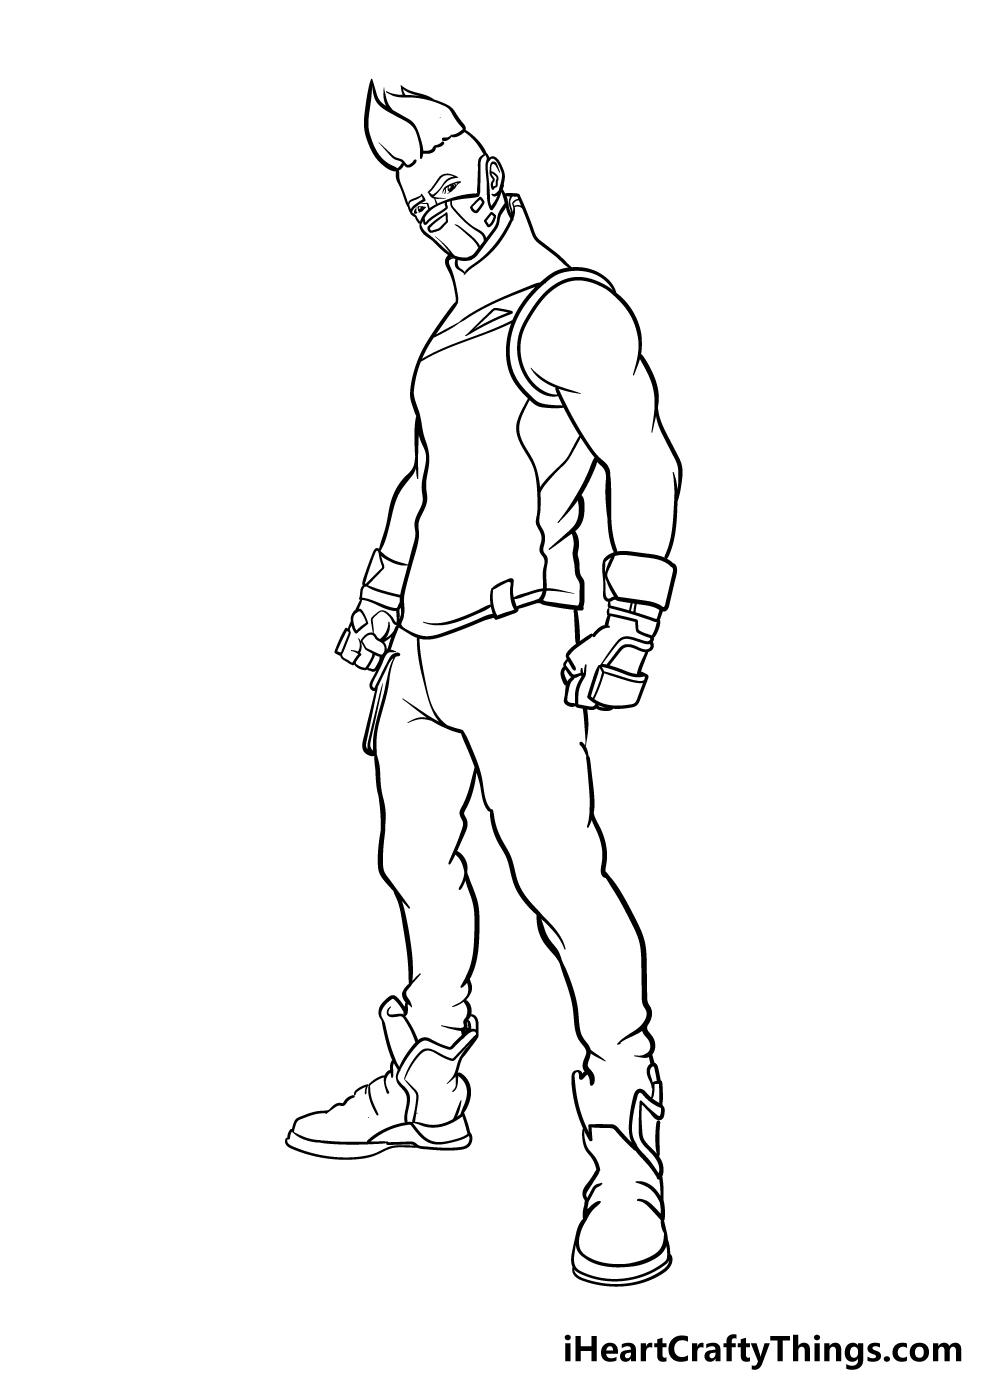 fortnite drawing step 7